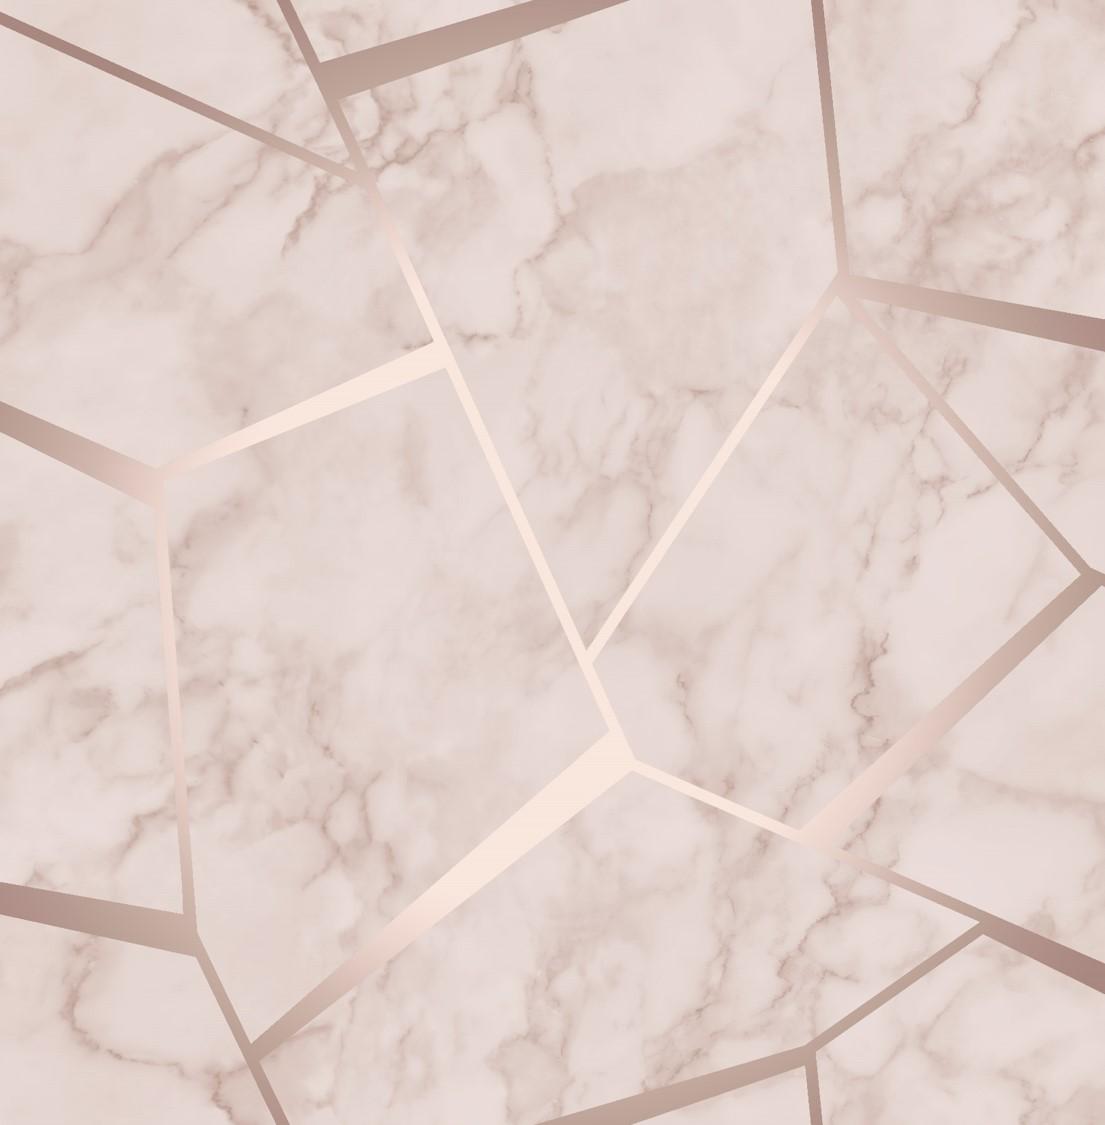 Fractal Geometric Marble Wallpaper Rose Gold FD42264 Wallpaper Sales 1105x1125